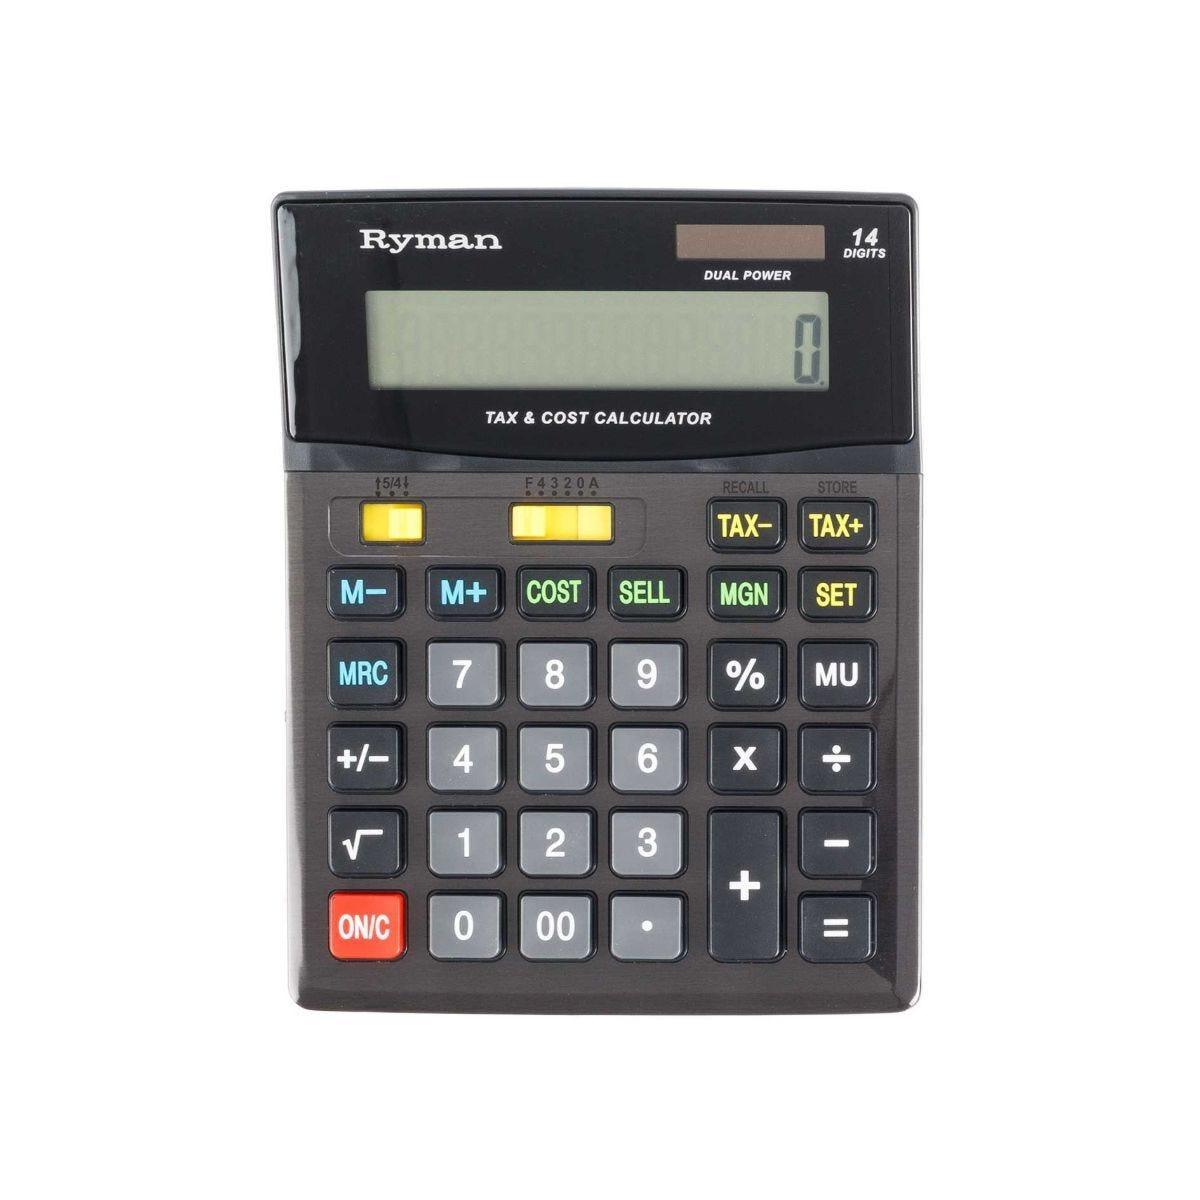 Ryman 14 Digit Calculator DX-14CSMTAX